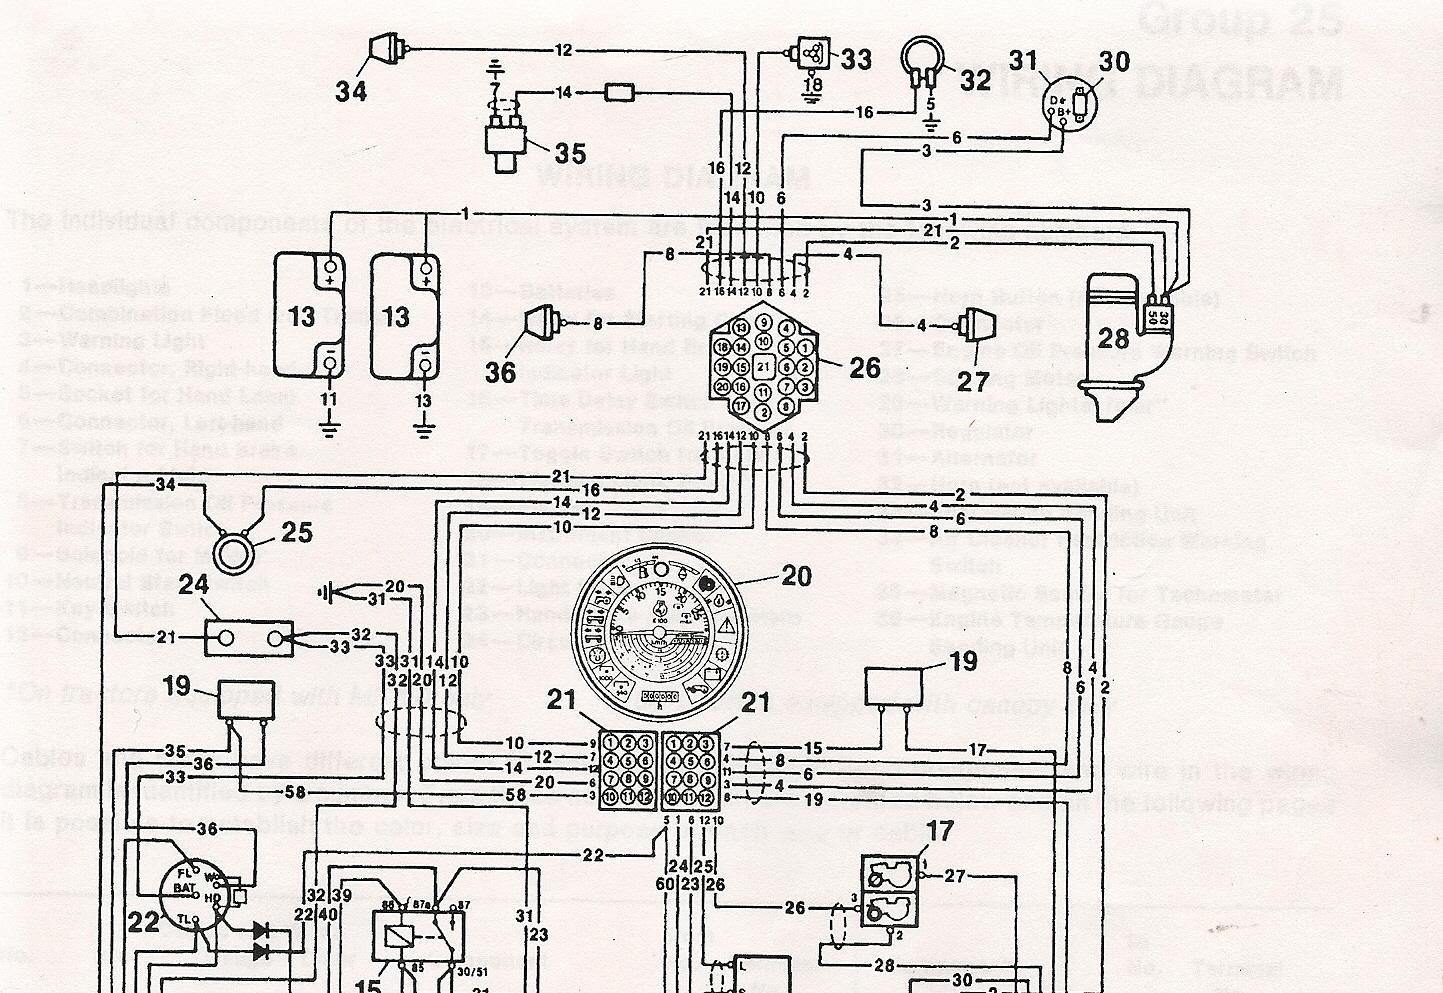 Stupendous 2010 John Deere Wiring Diagram Wiring Library Wiring Cloud Lukepaidewilluminateatxorg